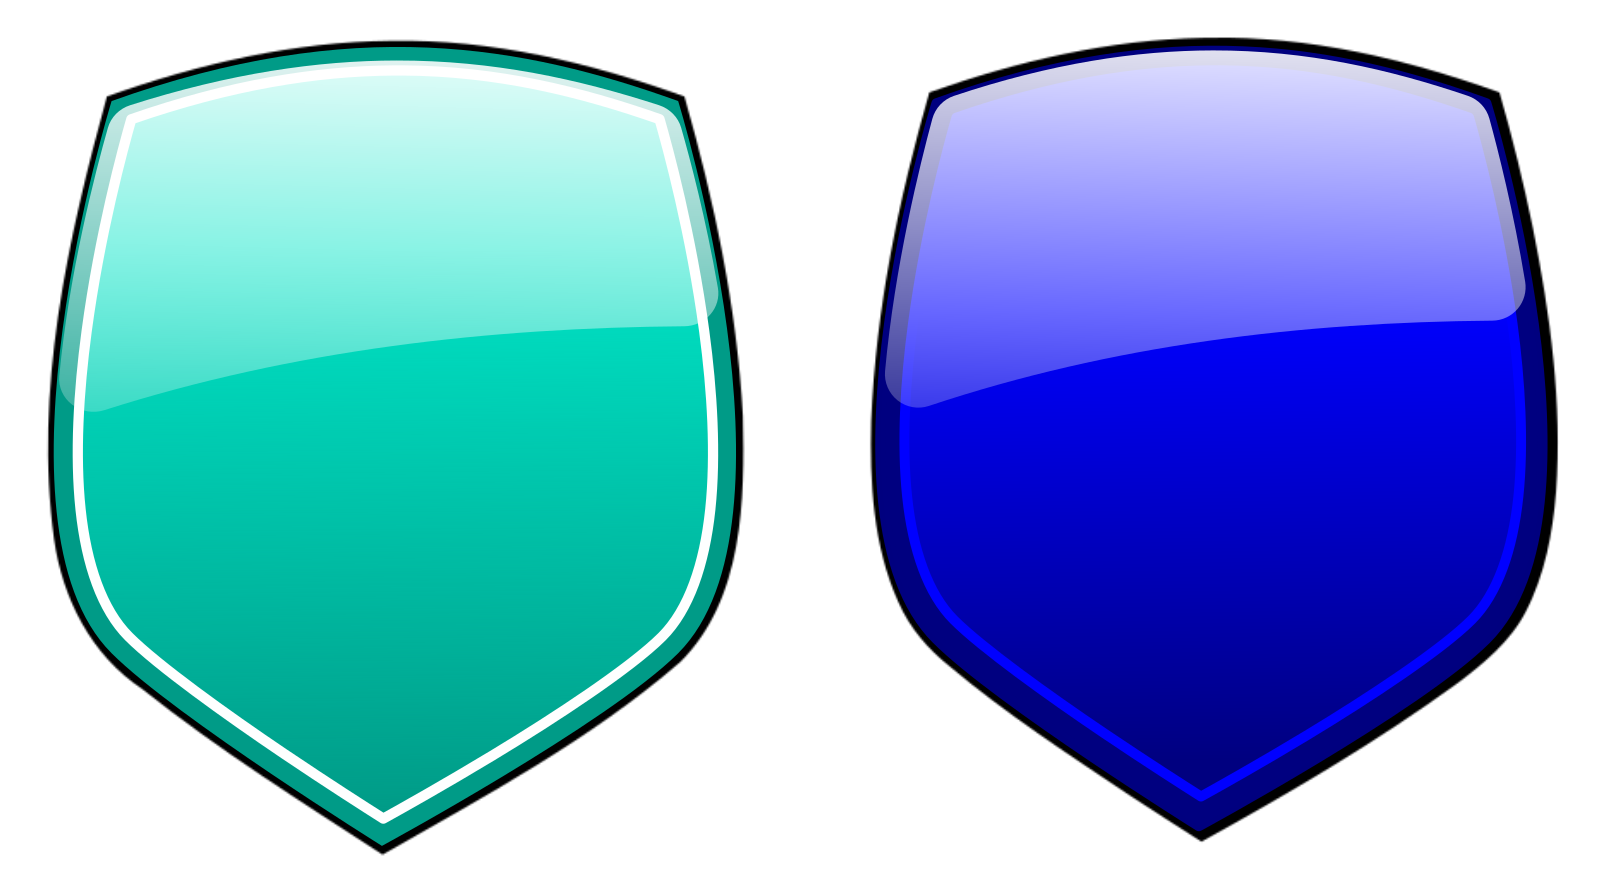 Harley Mc Gold And Blue SVG Clip arts